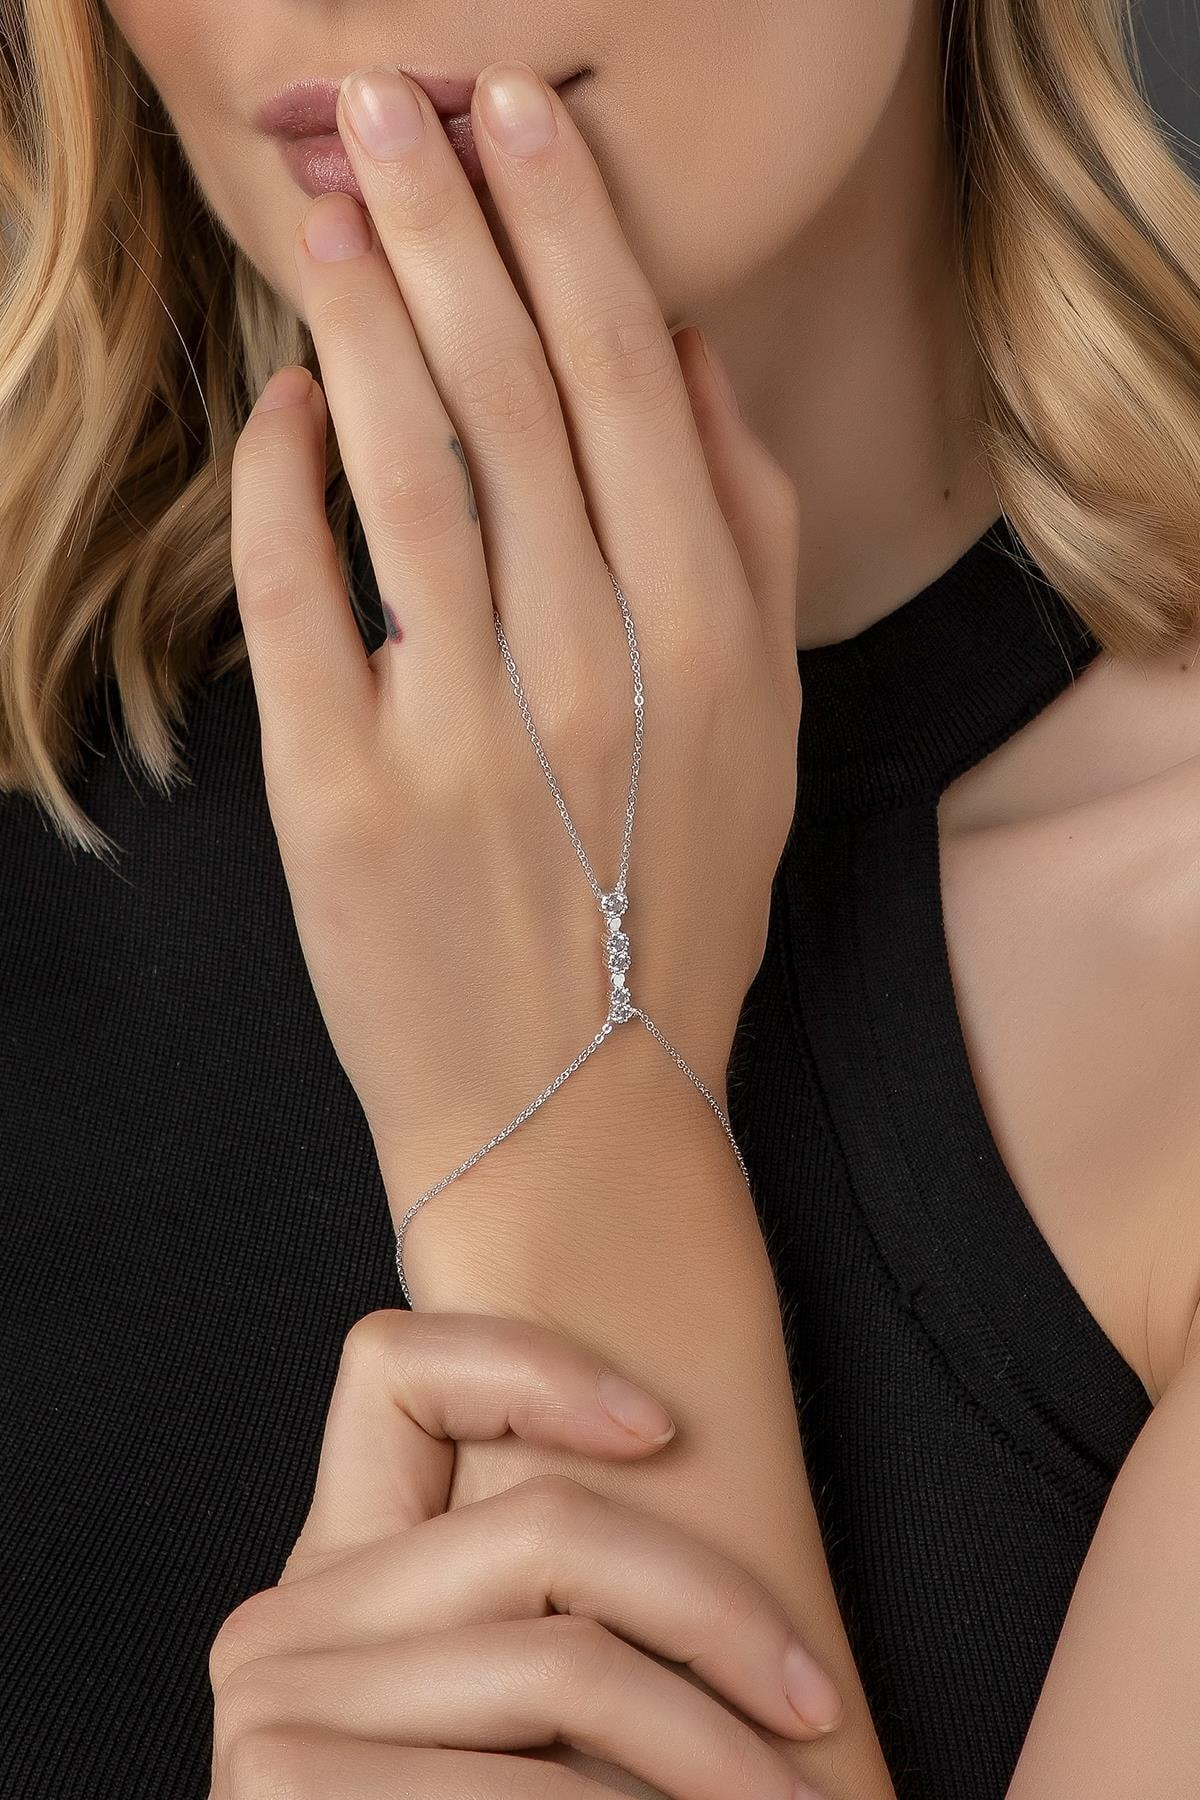 Modex Kadın Gümüş Zirkon Taşlı Şahmeran 1